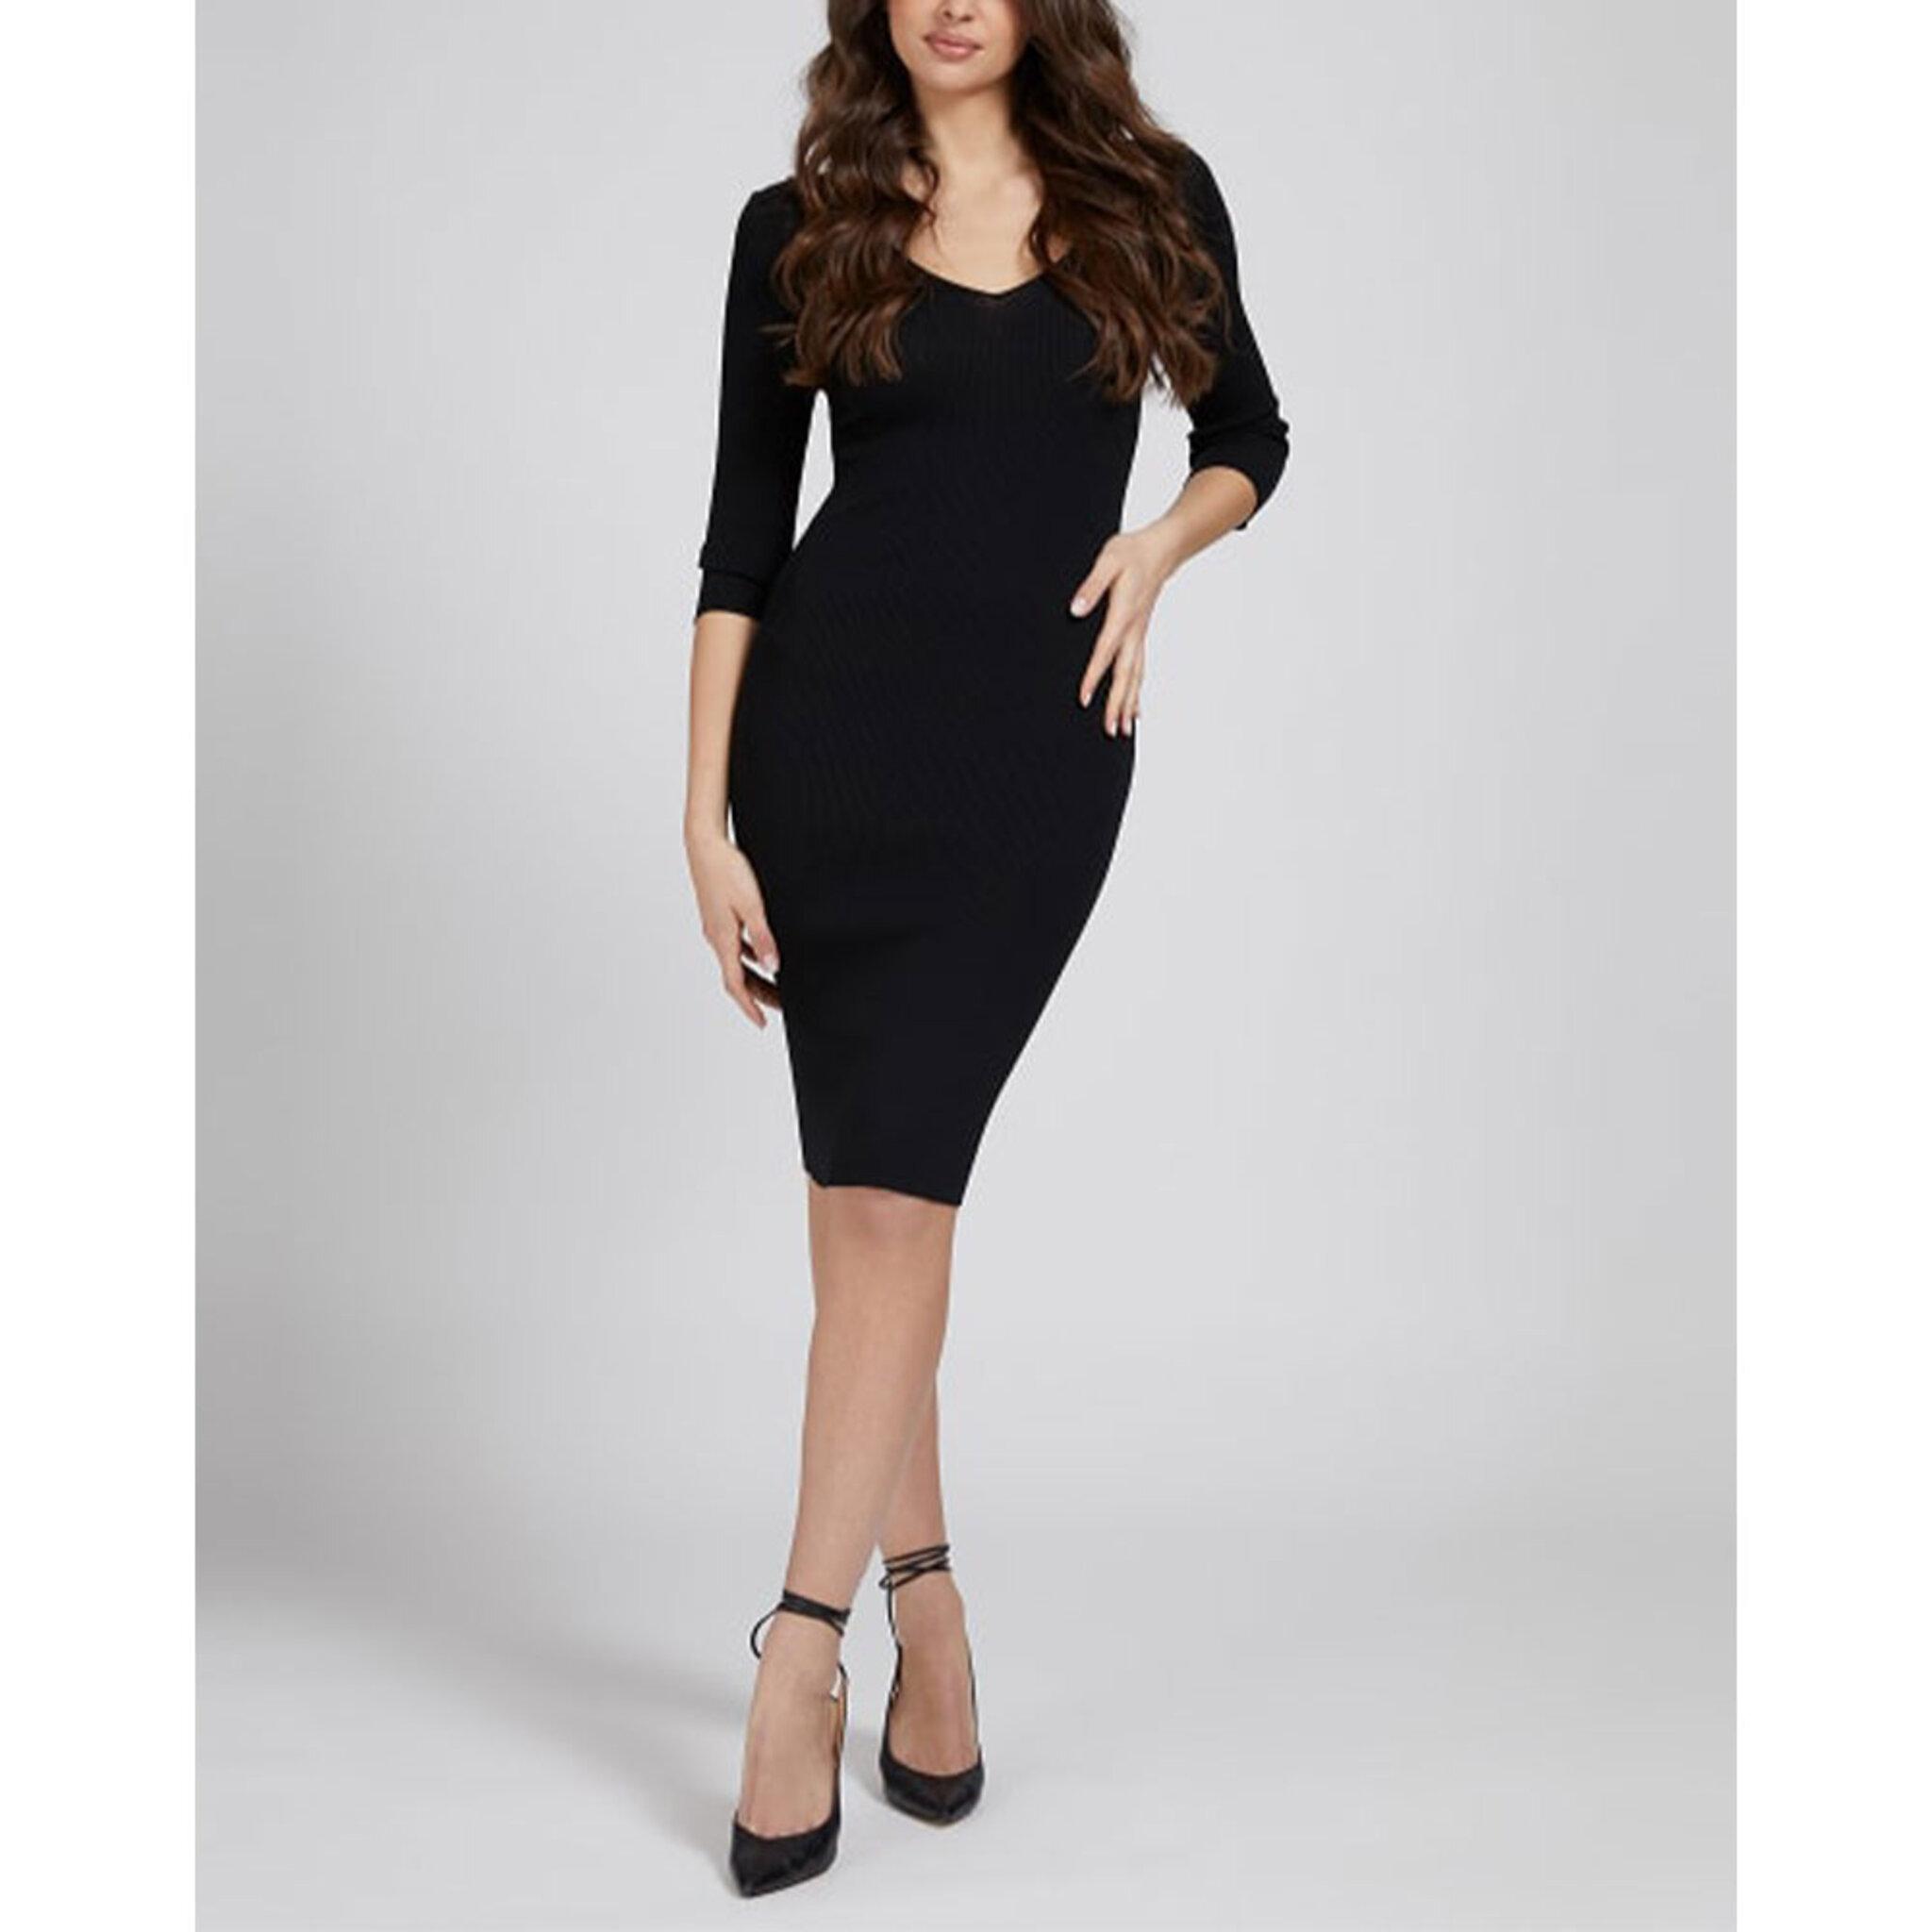 Florie Dress